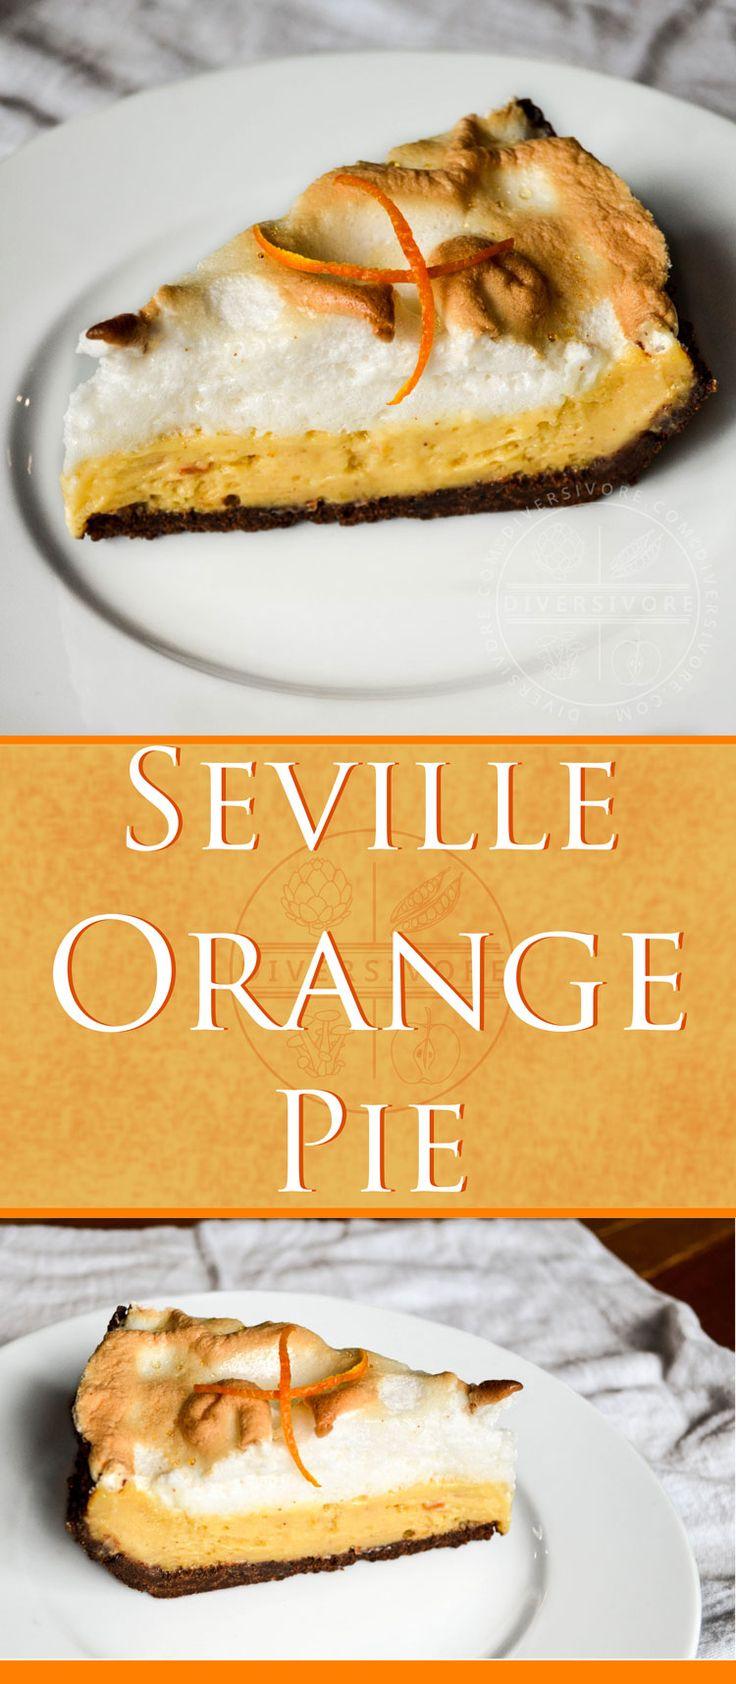 Seville orange (aka sour, bigarade, or marmalade orange) and lemon pie with a meringue and chocolate graham cracker crust.  Seriously delicious dessert decadence, for the true orange afficianado.